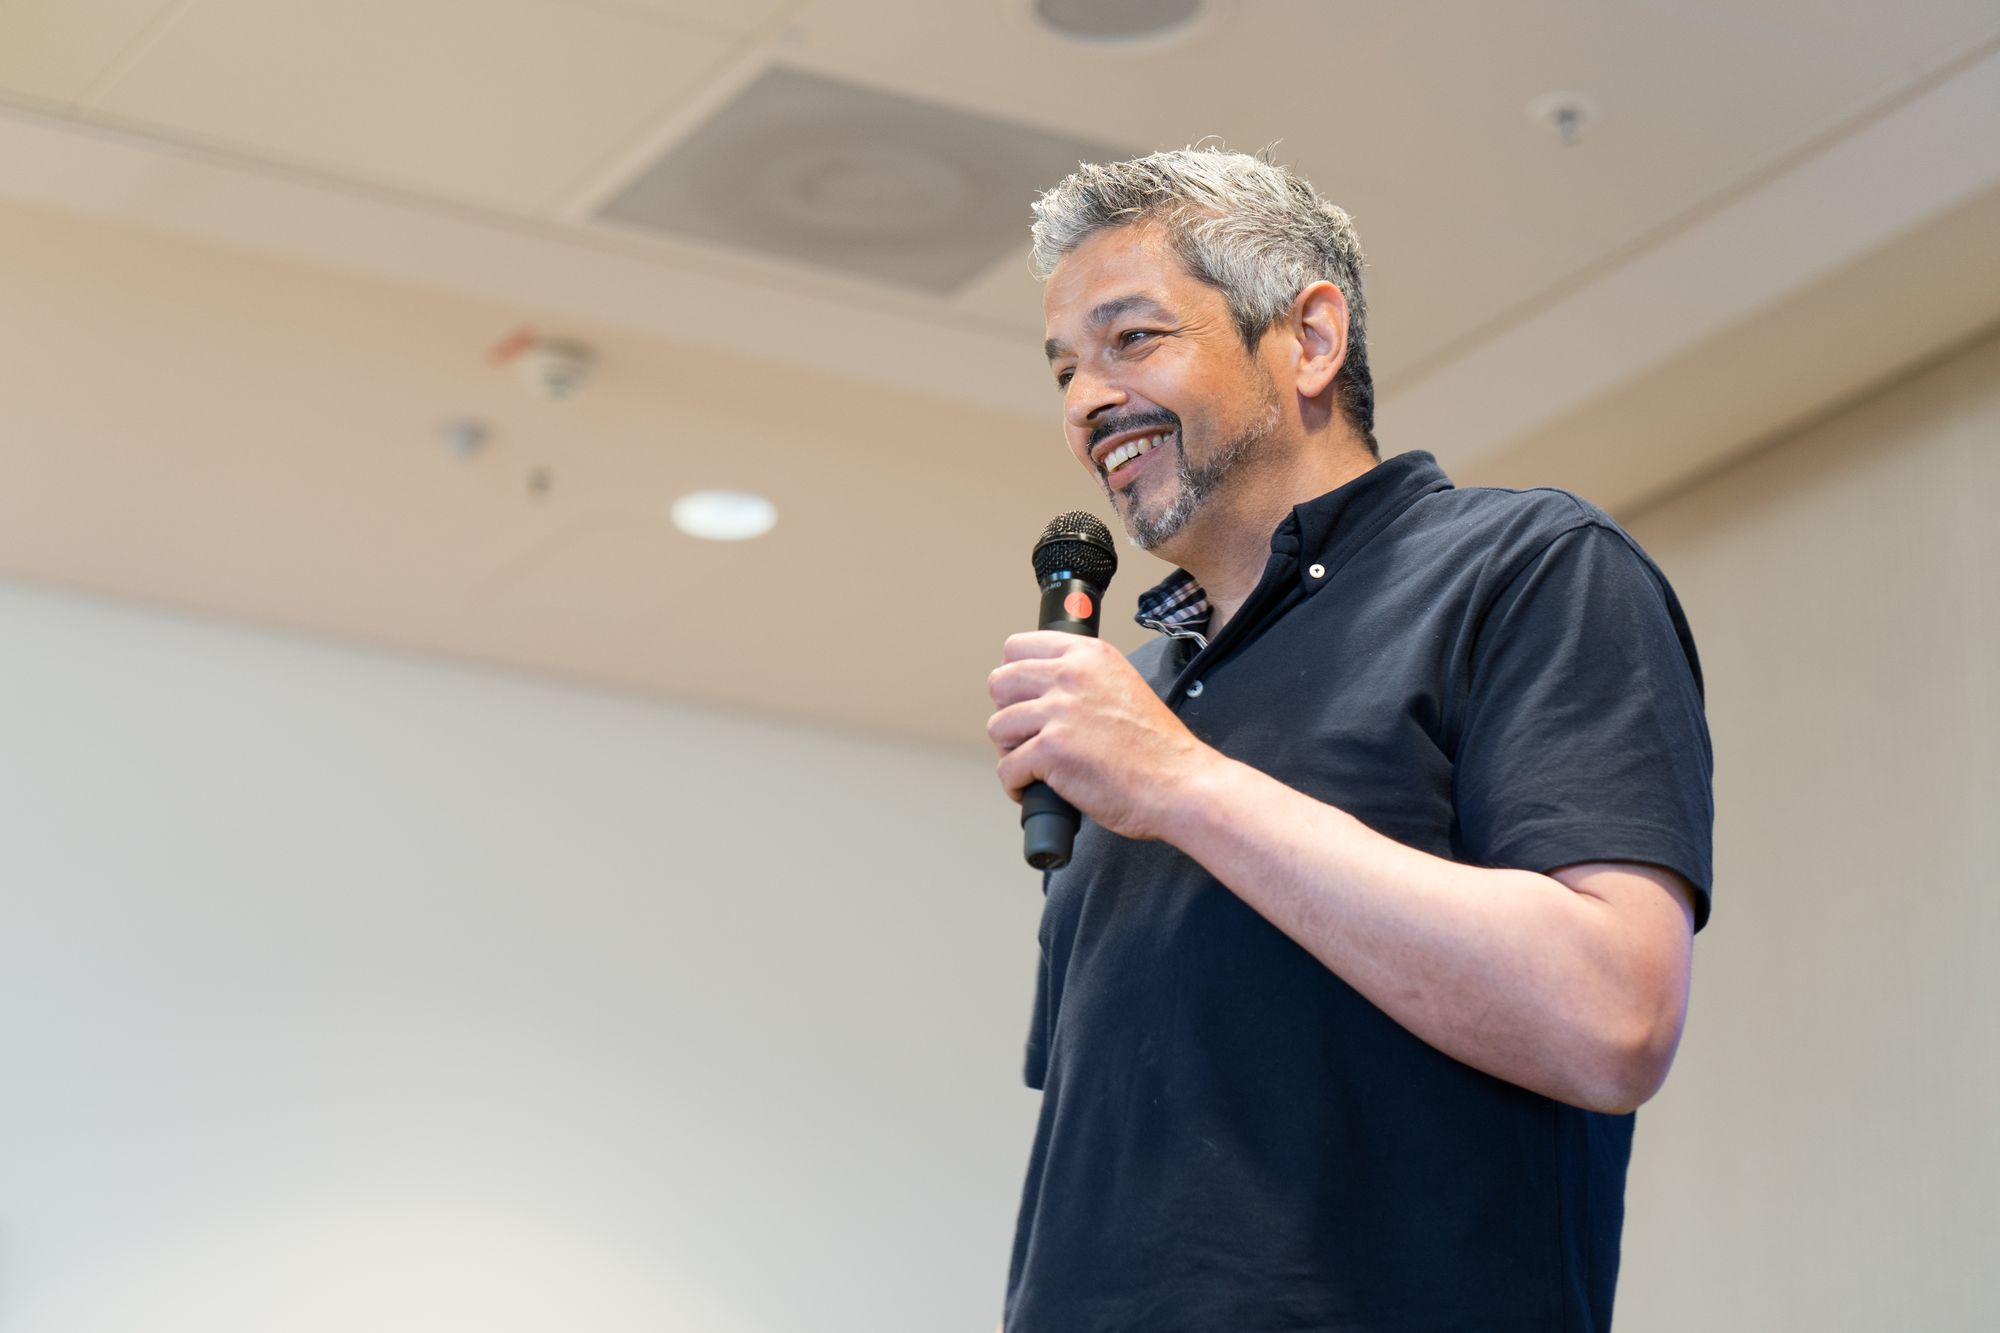 Jean-Claude Capanna als Sprecher auf dem Builderall Everest 2019 in Nürnberg (Germany)